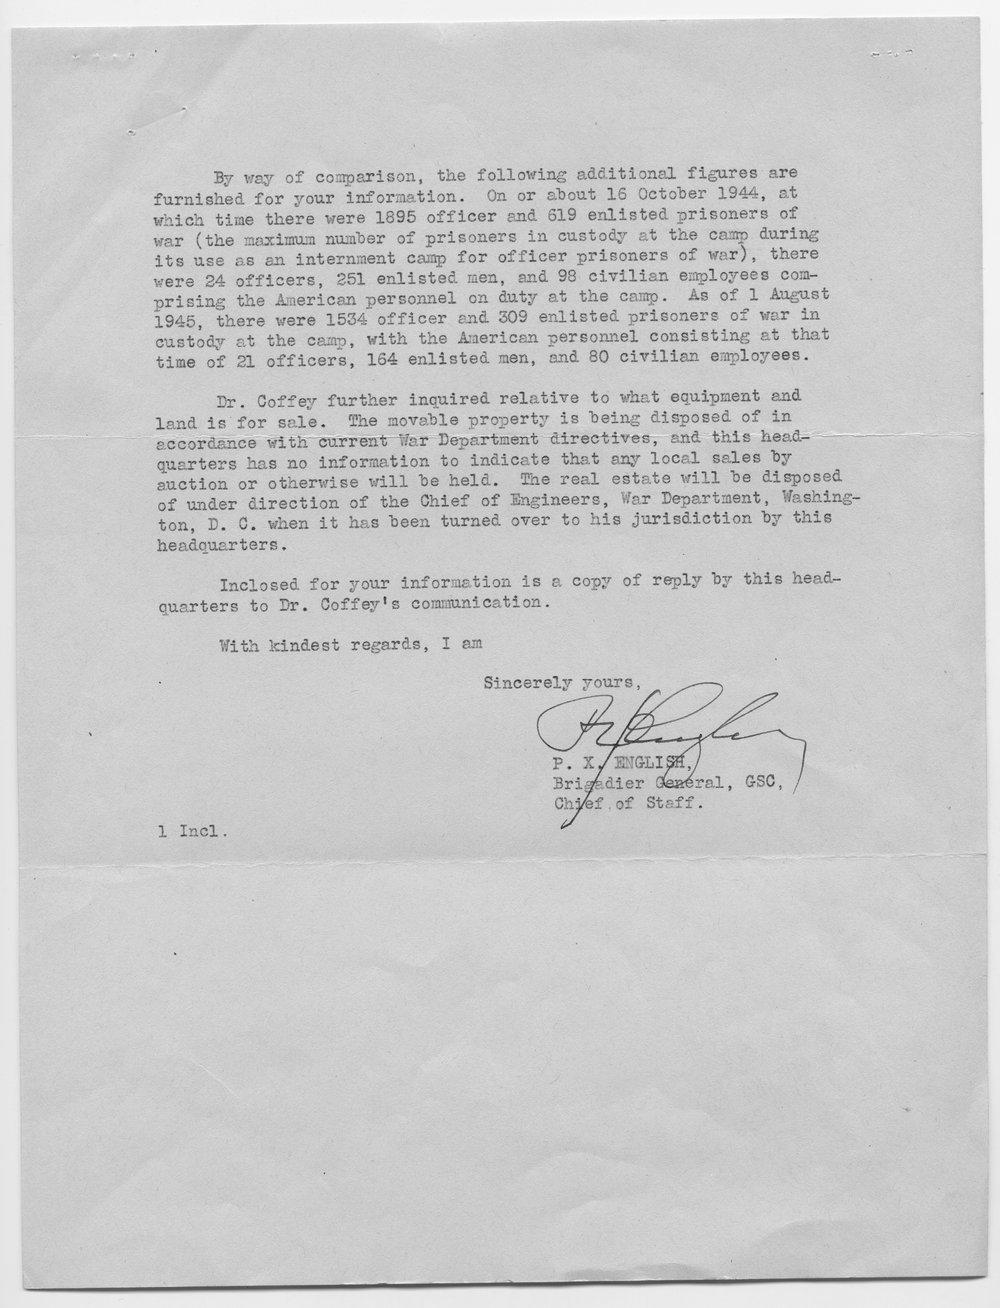 P. X. English to Senator Arthur Capper - 2